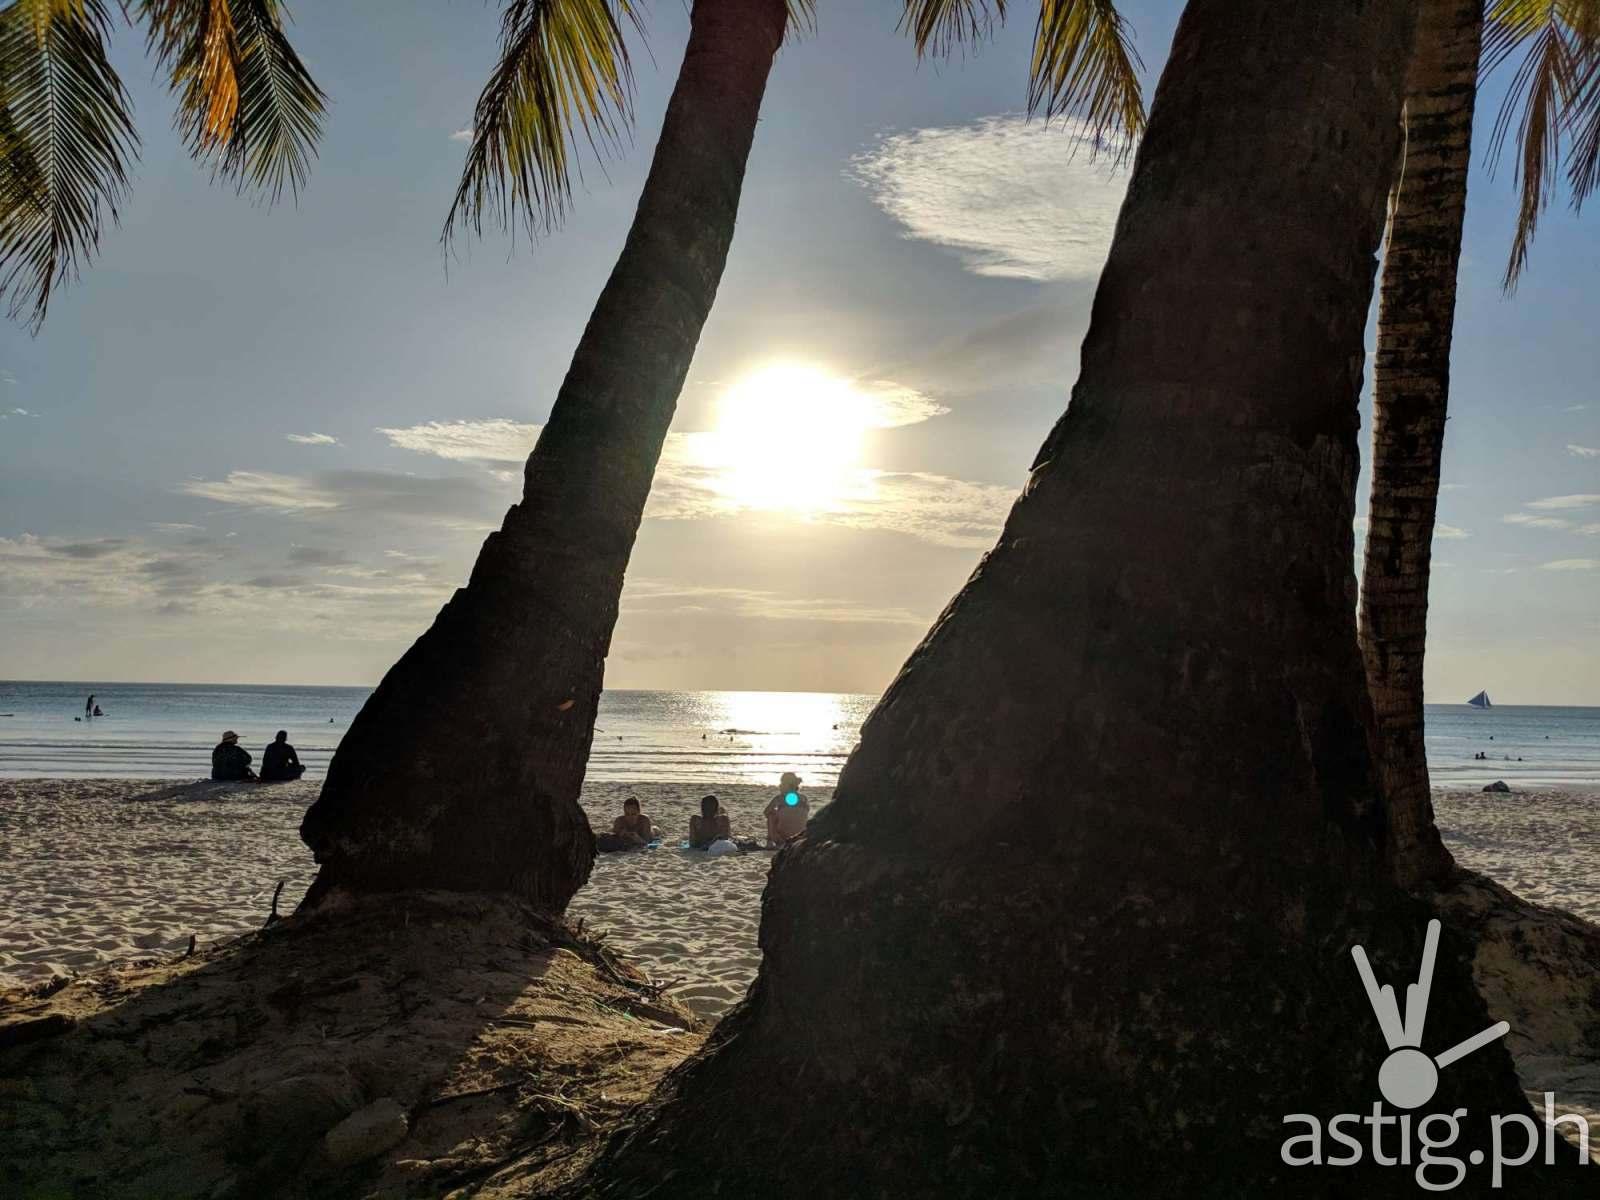 Boracay Philippines re-opening smartphone photo taken on an ASUS ZenFone 5 by Den Uy of TechKuya